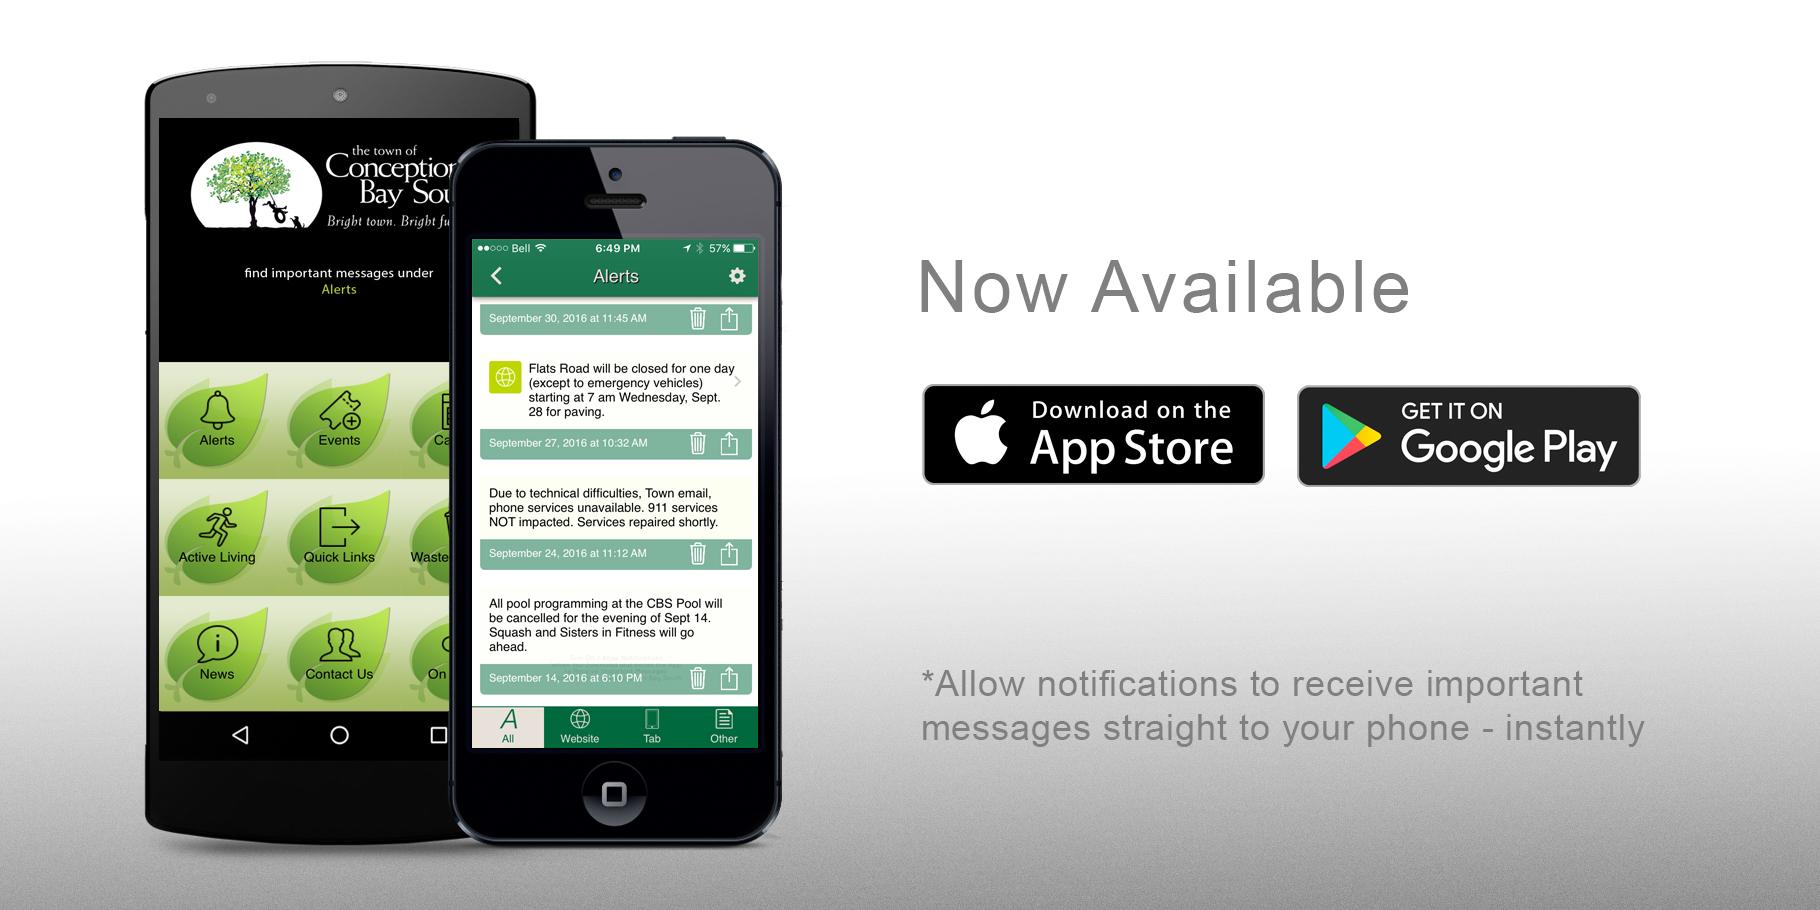 Conception Bay South, NL, App development, mobile communication, AppAds Promotions